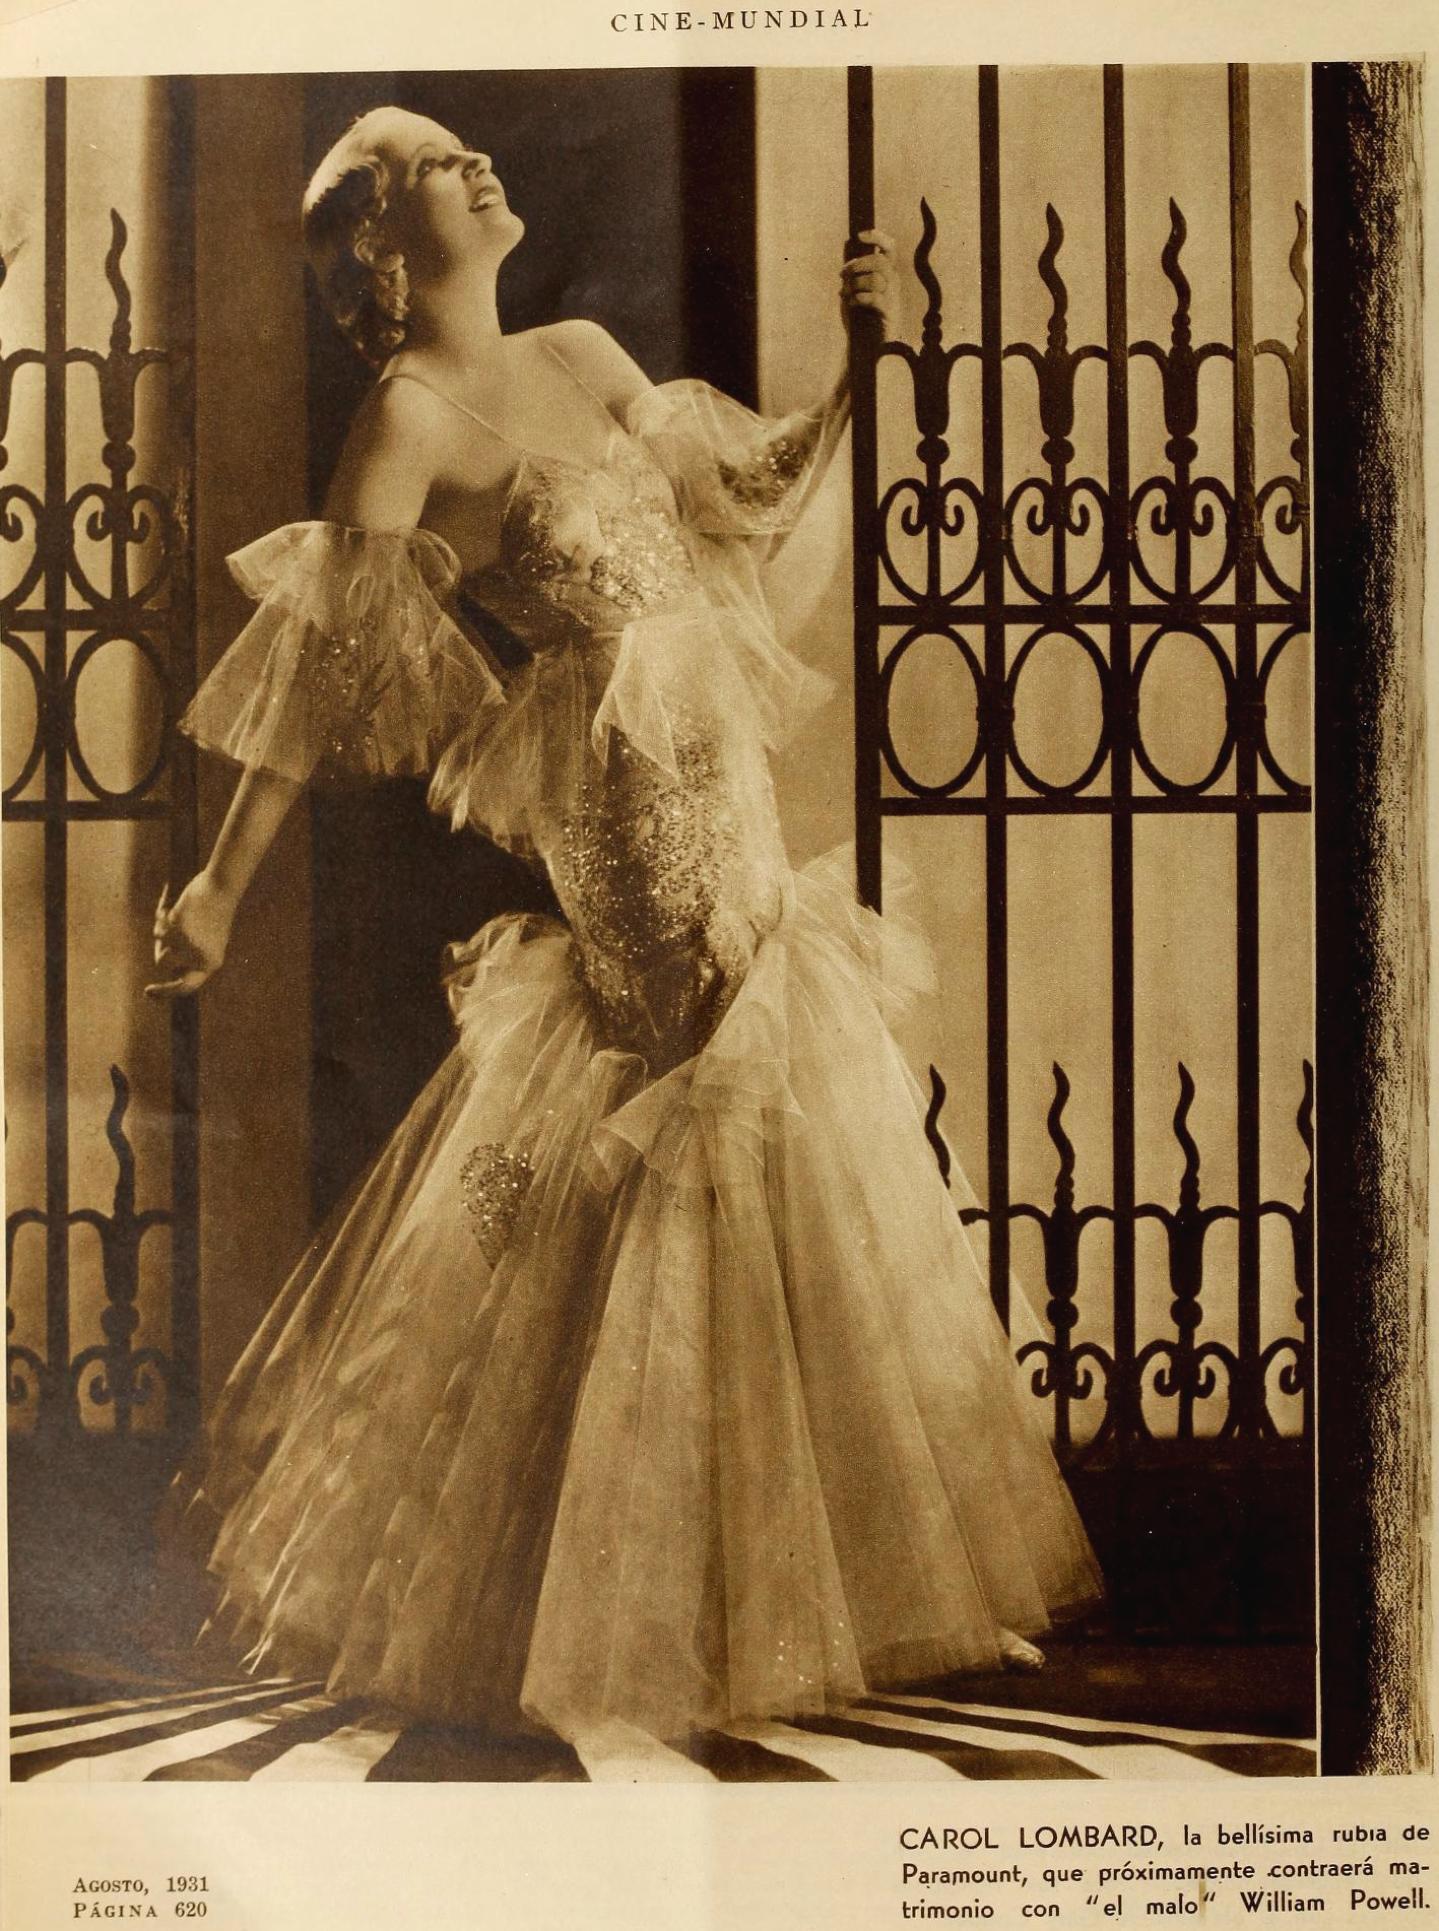 carole lombard cine mundial august 1931aa